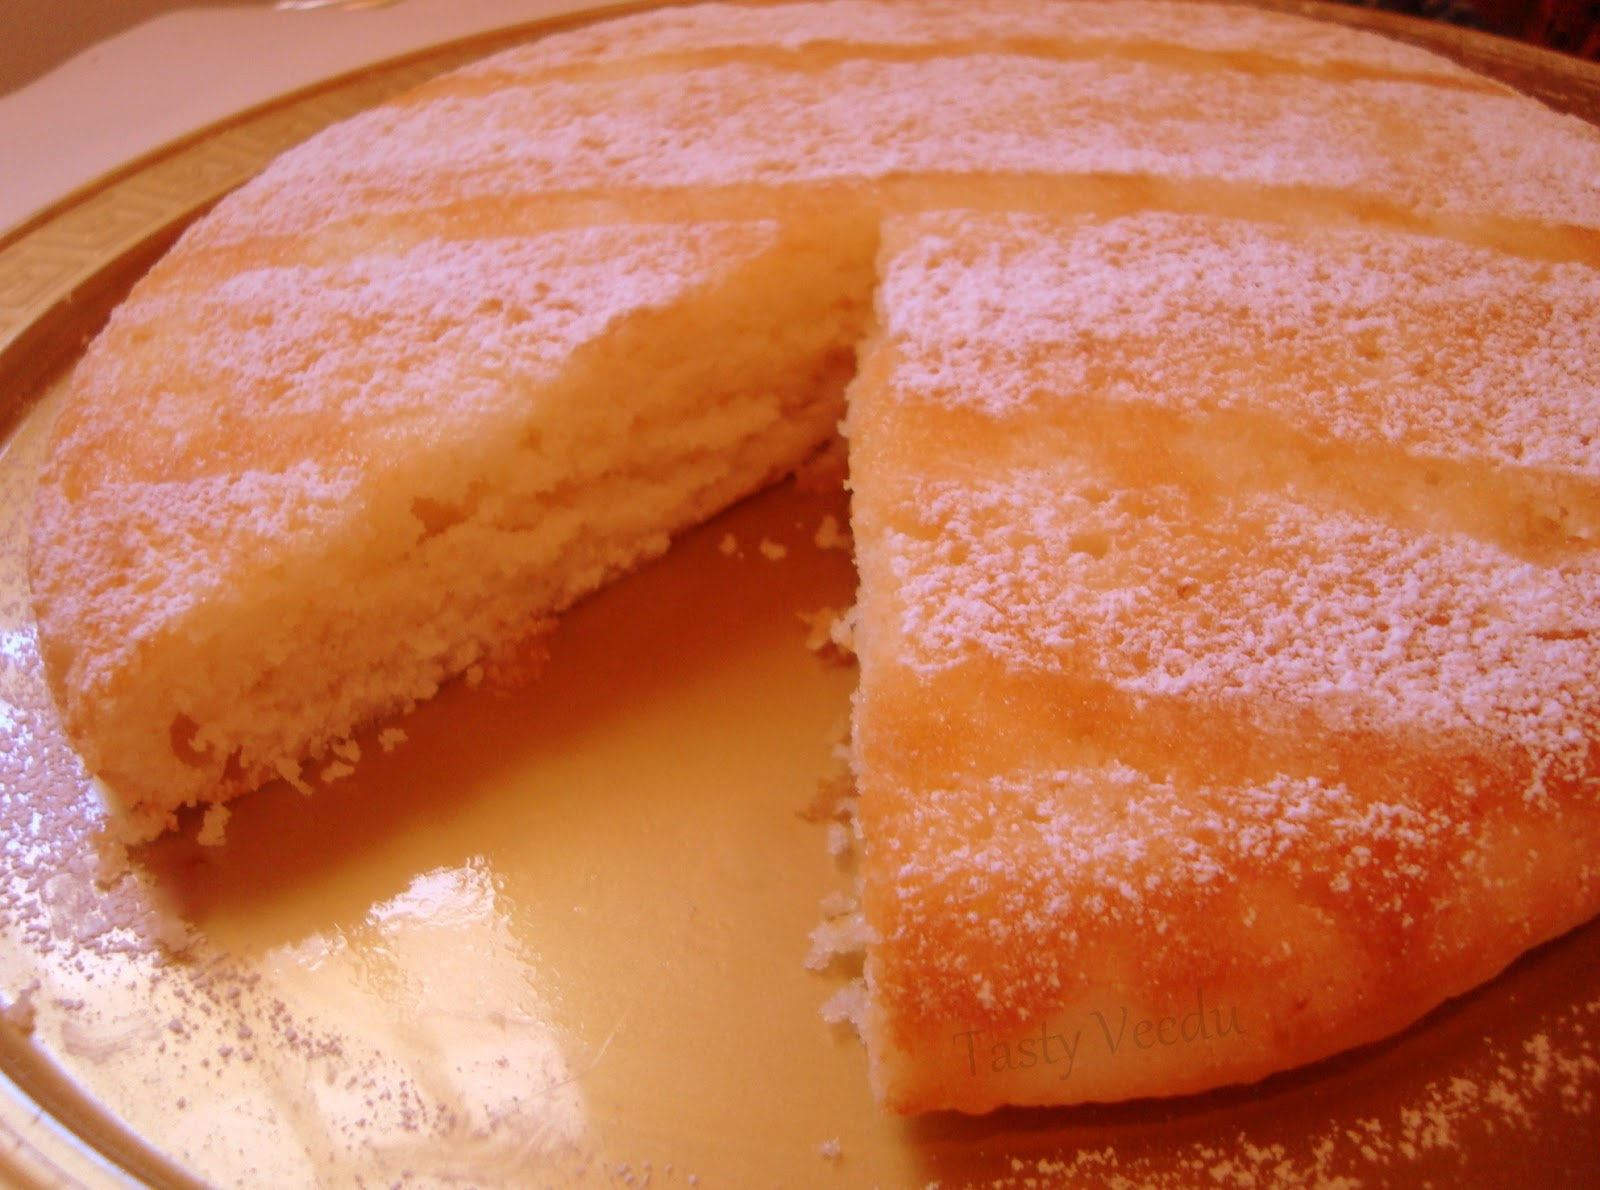 Eggless Vanilla Cake Recipe With Images : Tasty Veedu: VANILLA SPONGE CAKE (Eggless)